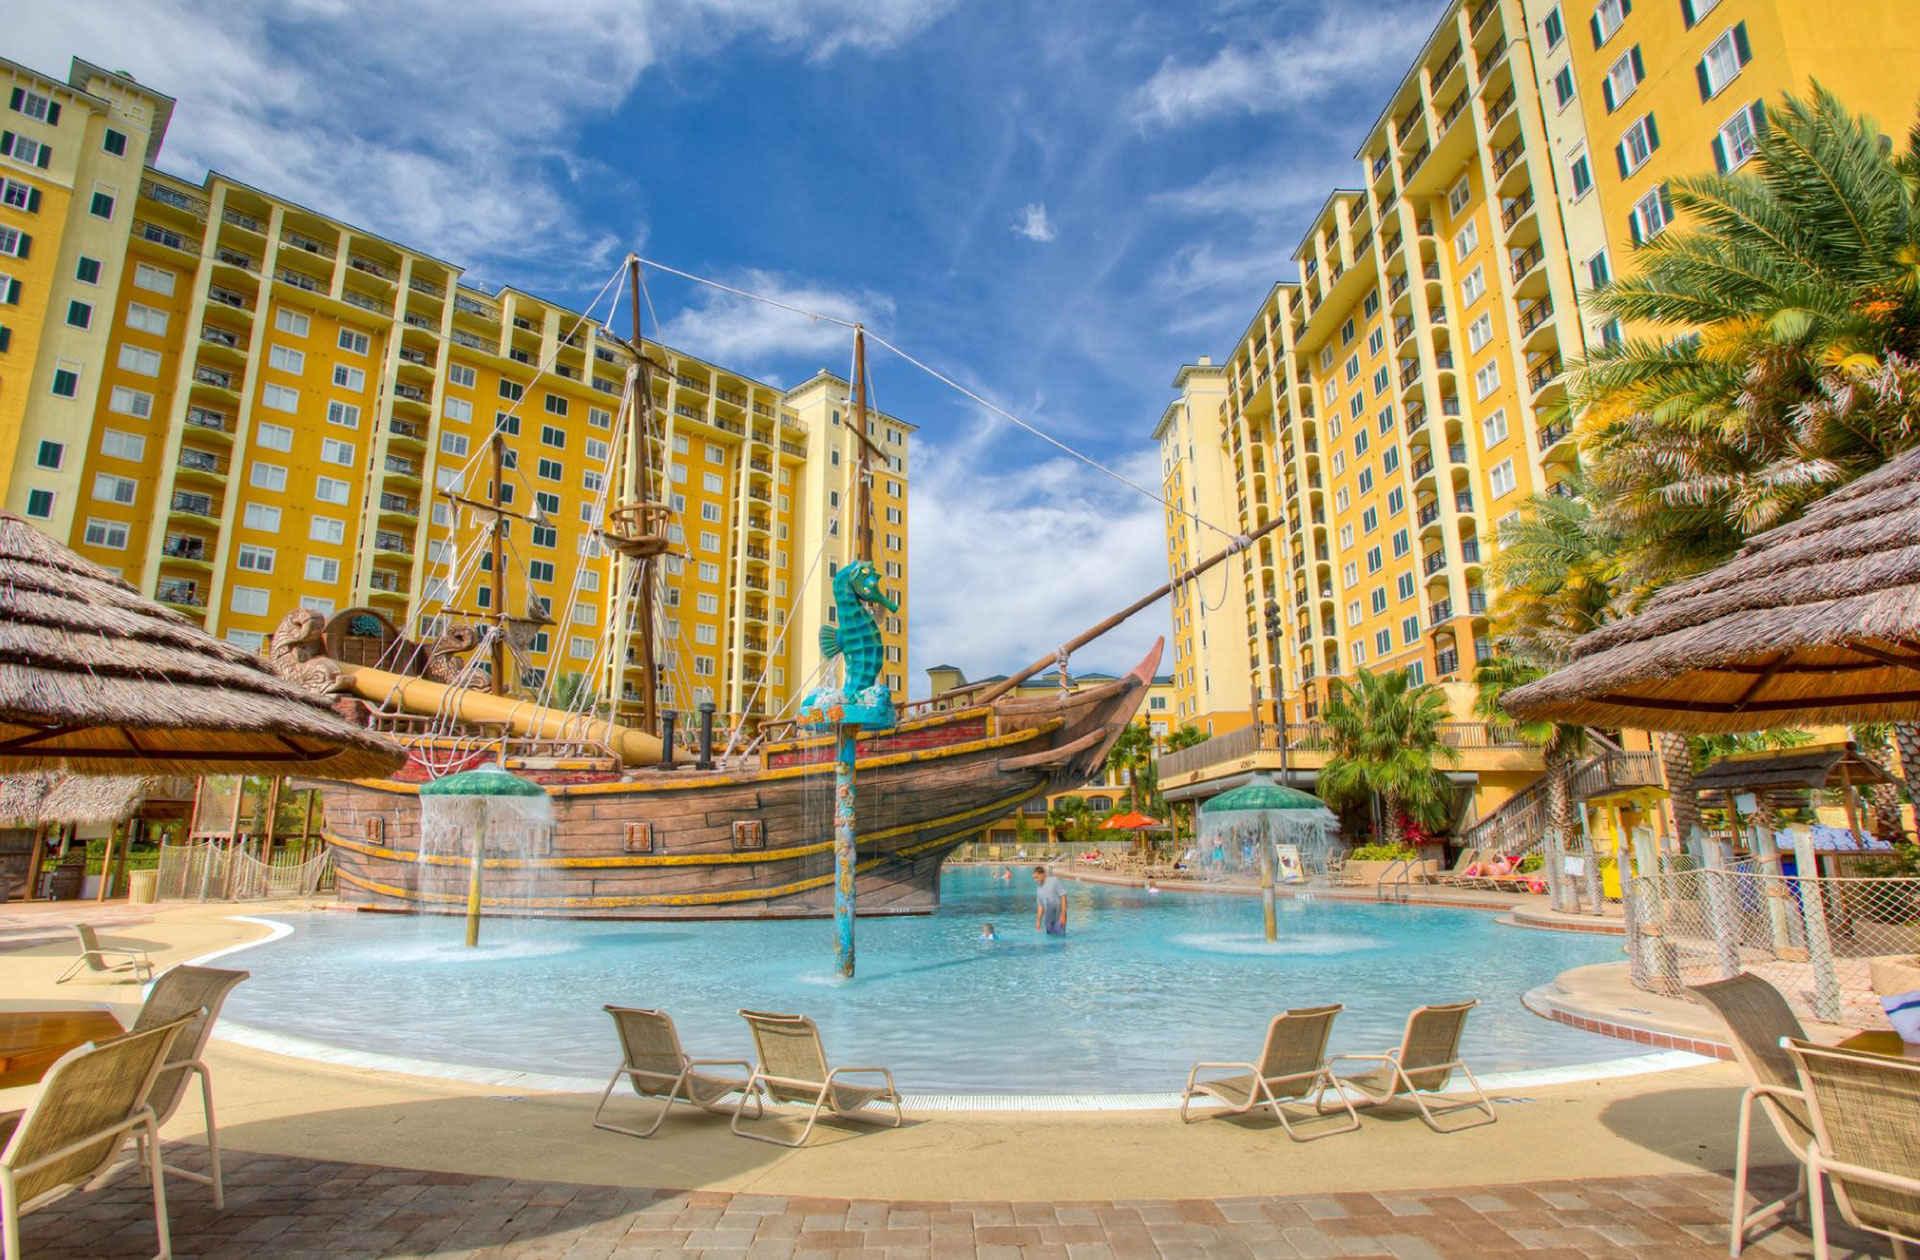 Pool at Lake Buena Vista Resort in Orlando